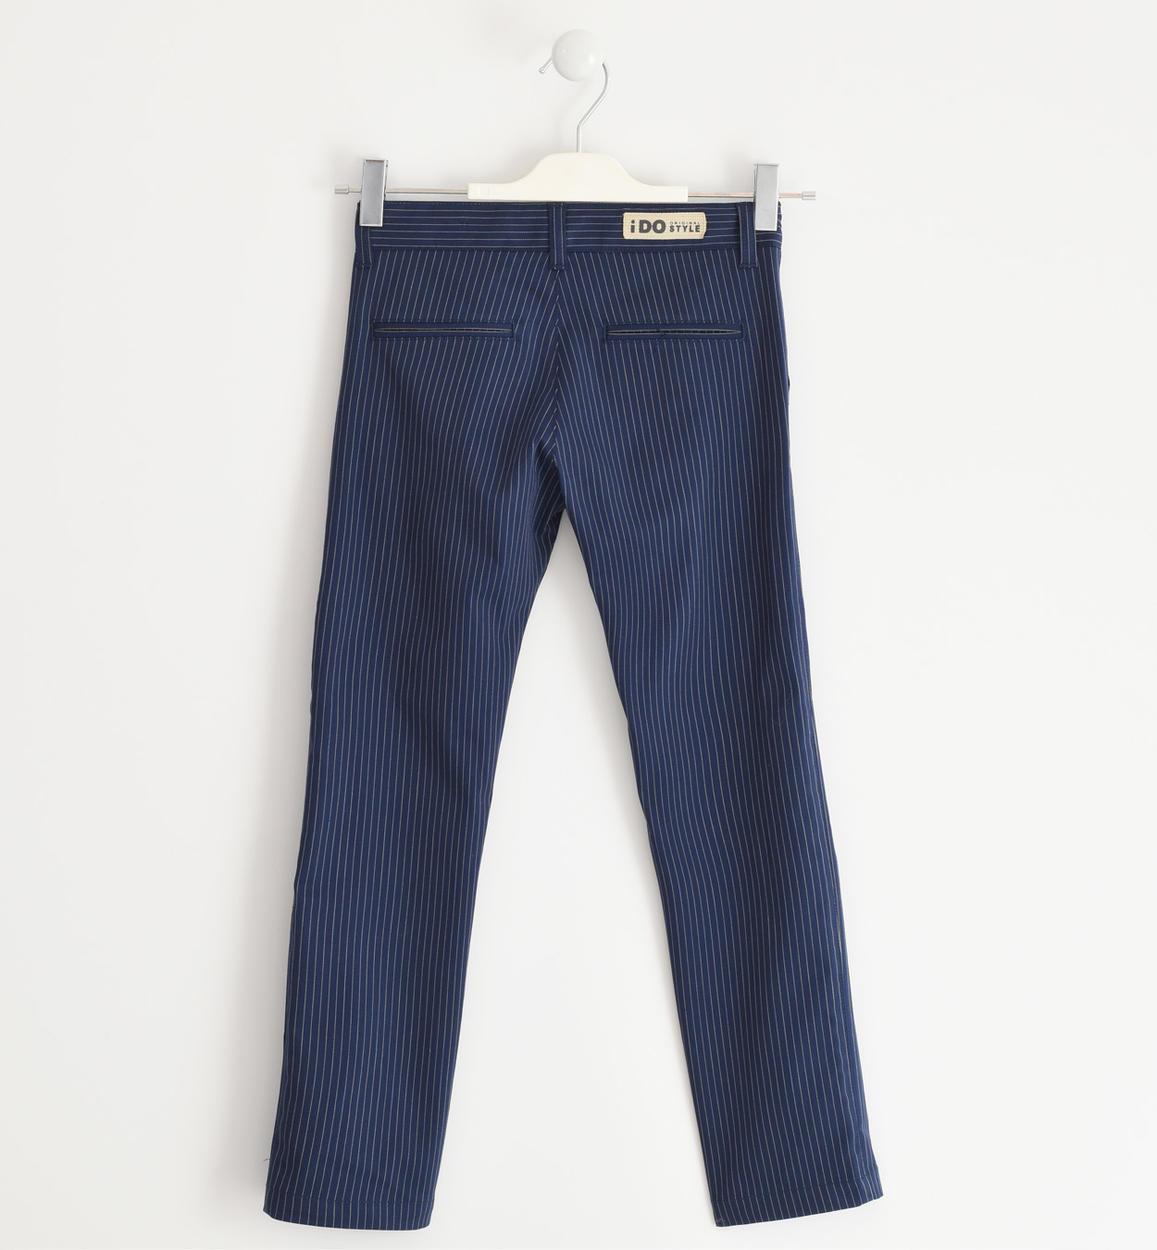 elegante pantalone ido slim fit per bamb navy dettaglio 03 2524j42000 3854 150x150